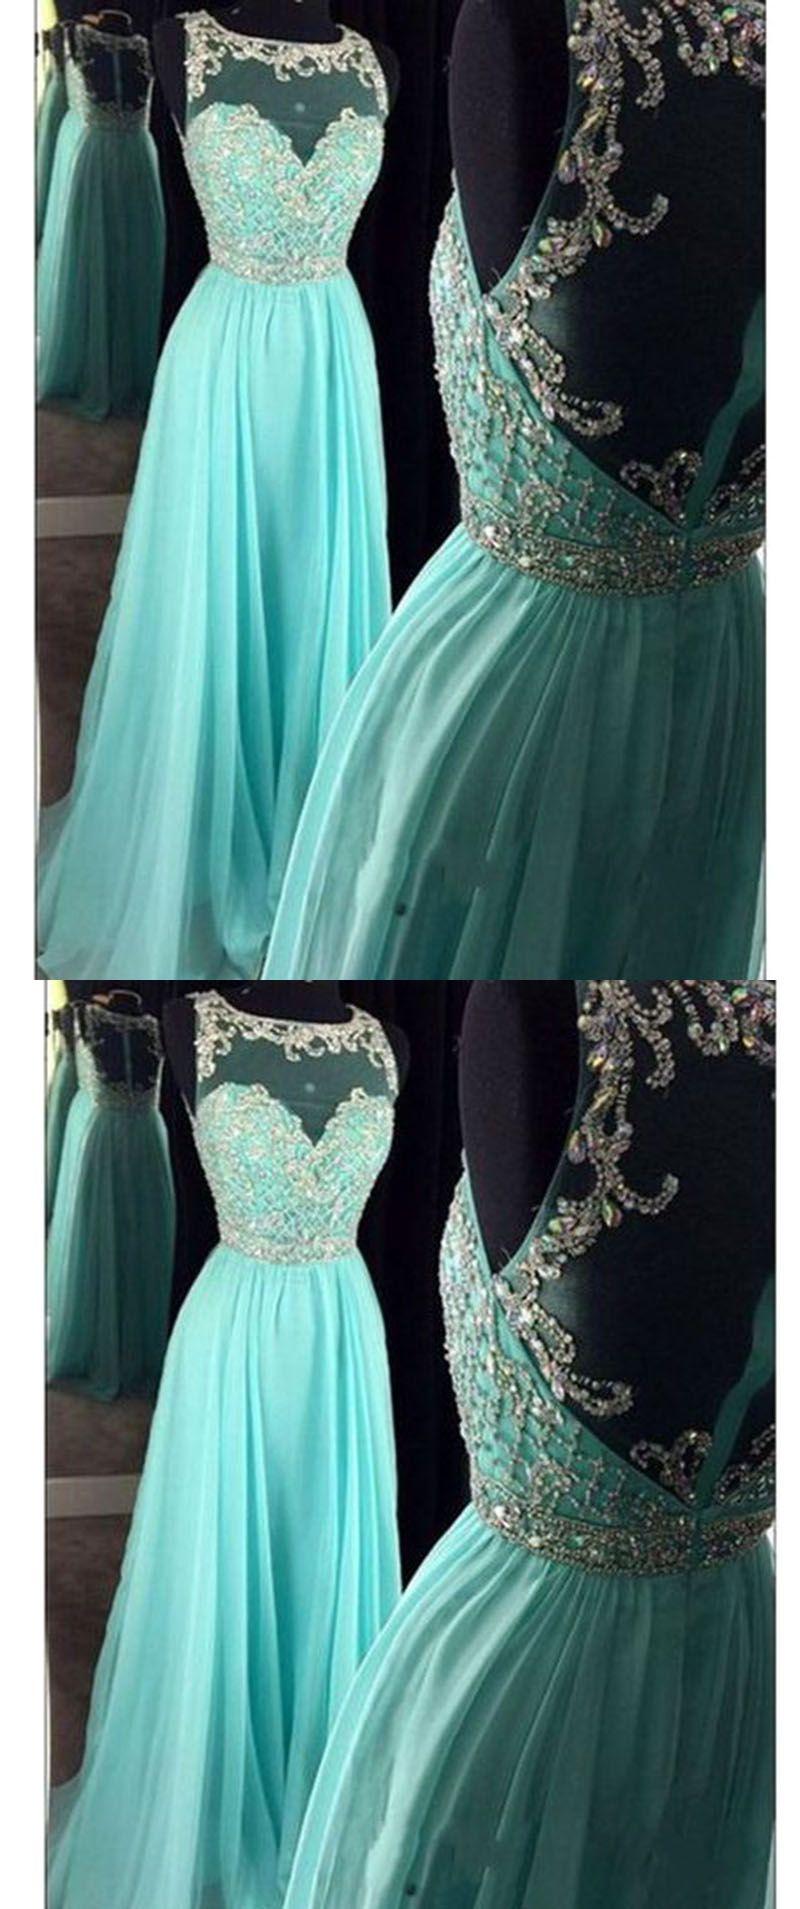 New scoop neck a line ice blue rhinestone prom dresses long pl